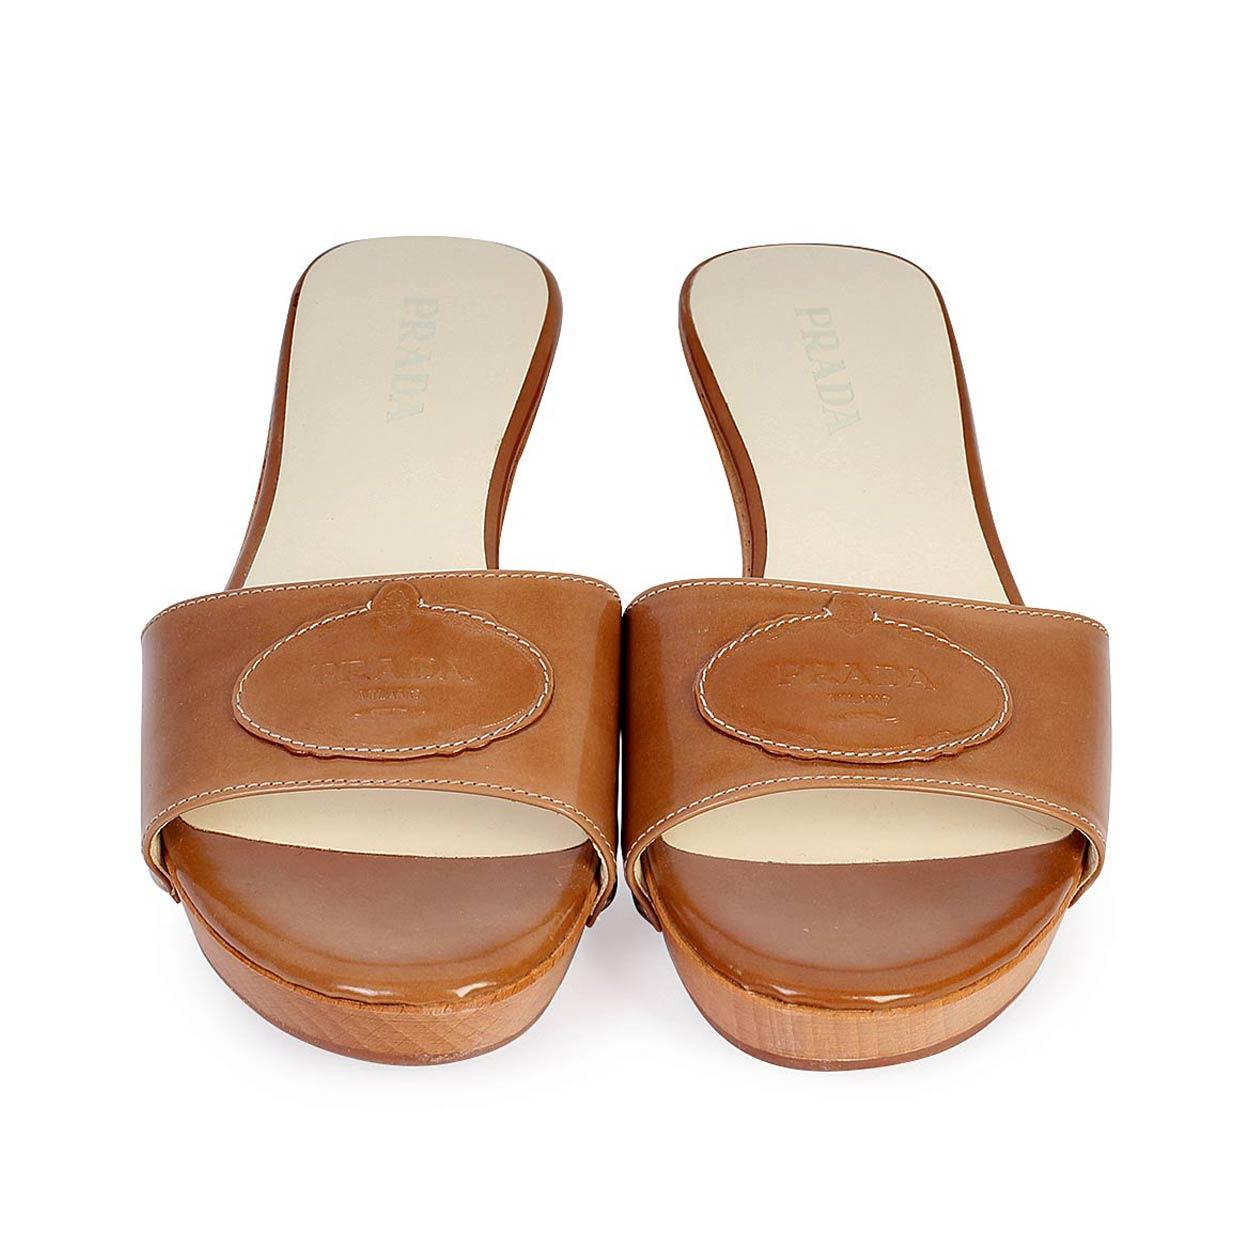 PRADA Wooden Slide Sandals - S: 37 (4)